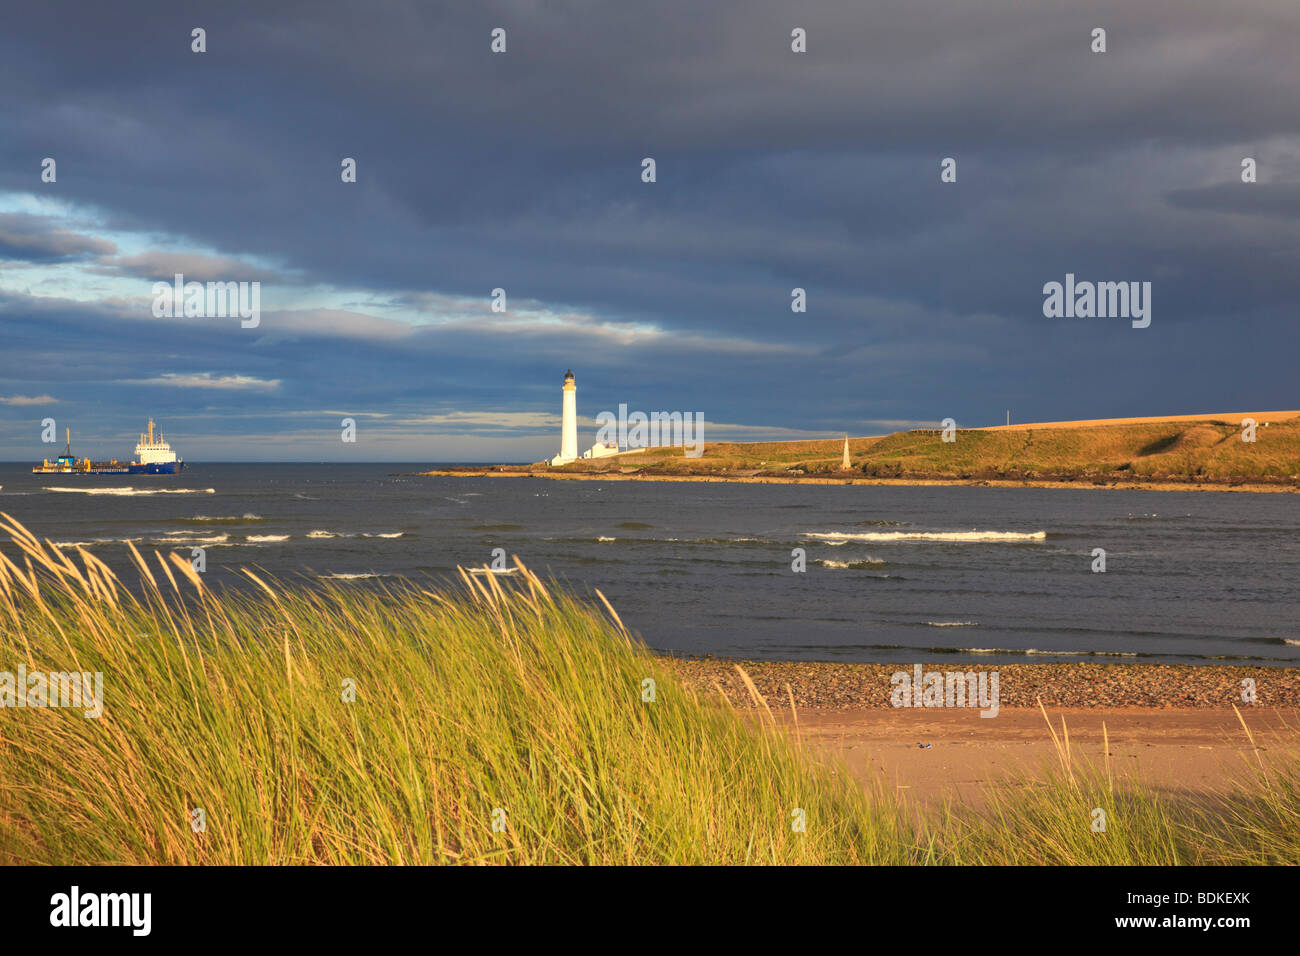 scurdie-ness-lighthouse-montrose-BDKEXK.